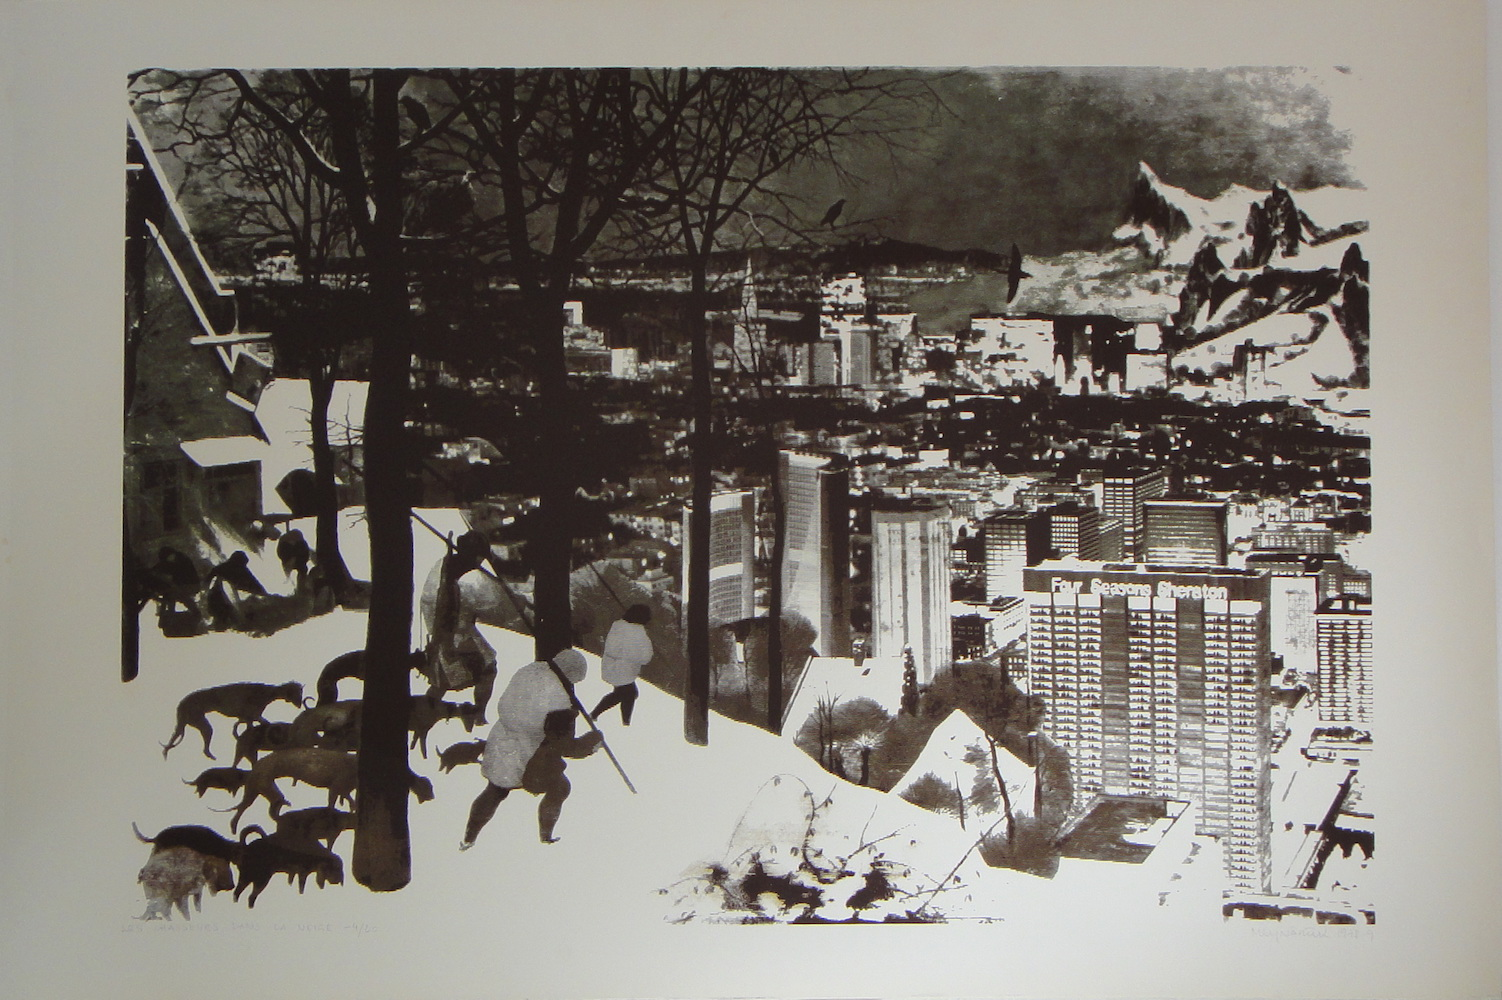 1978, Les chasseurs la neige, Argillia, serigrafia, číslo 4/20, 64x94,5